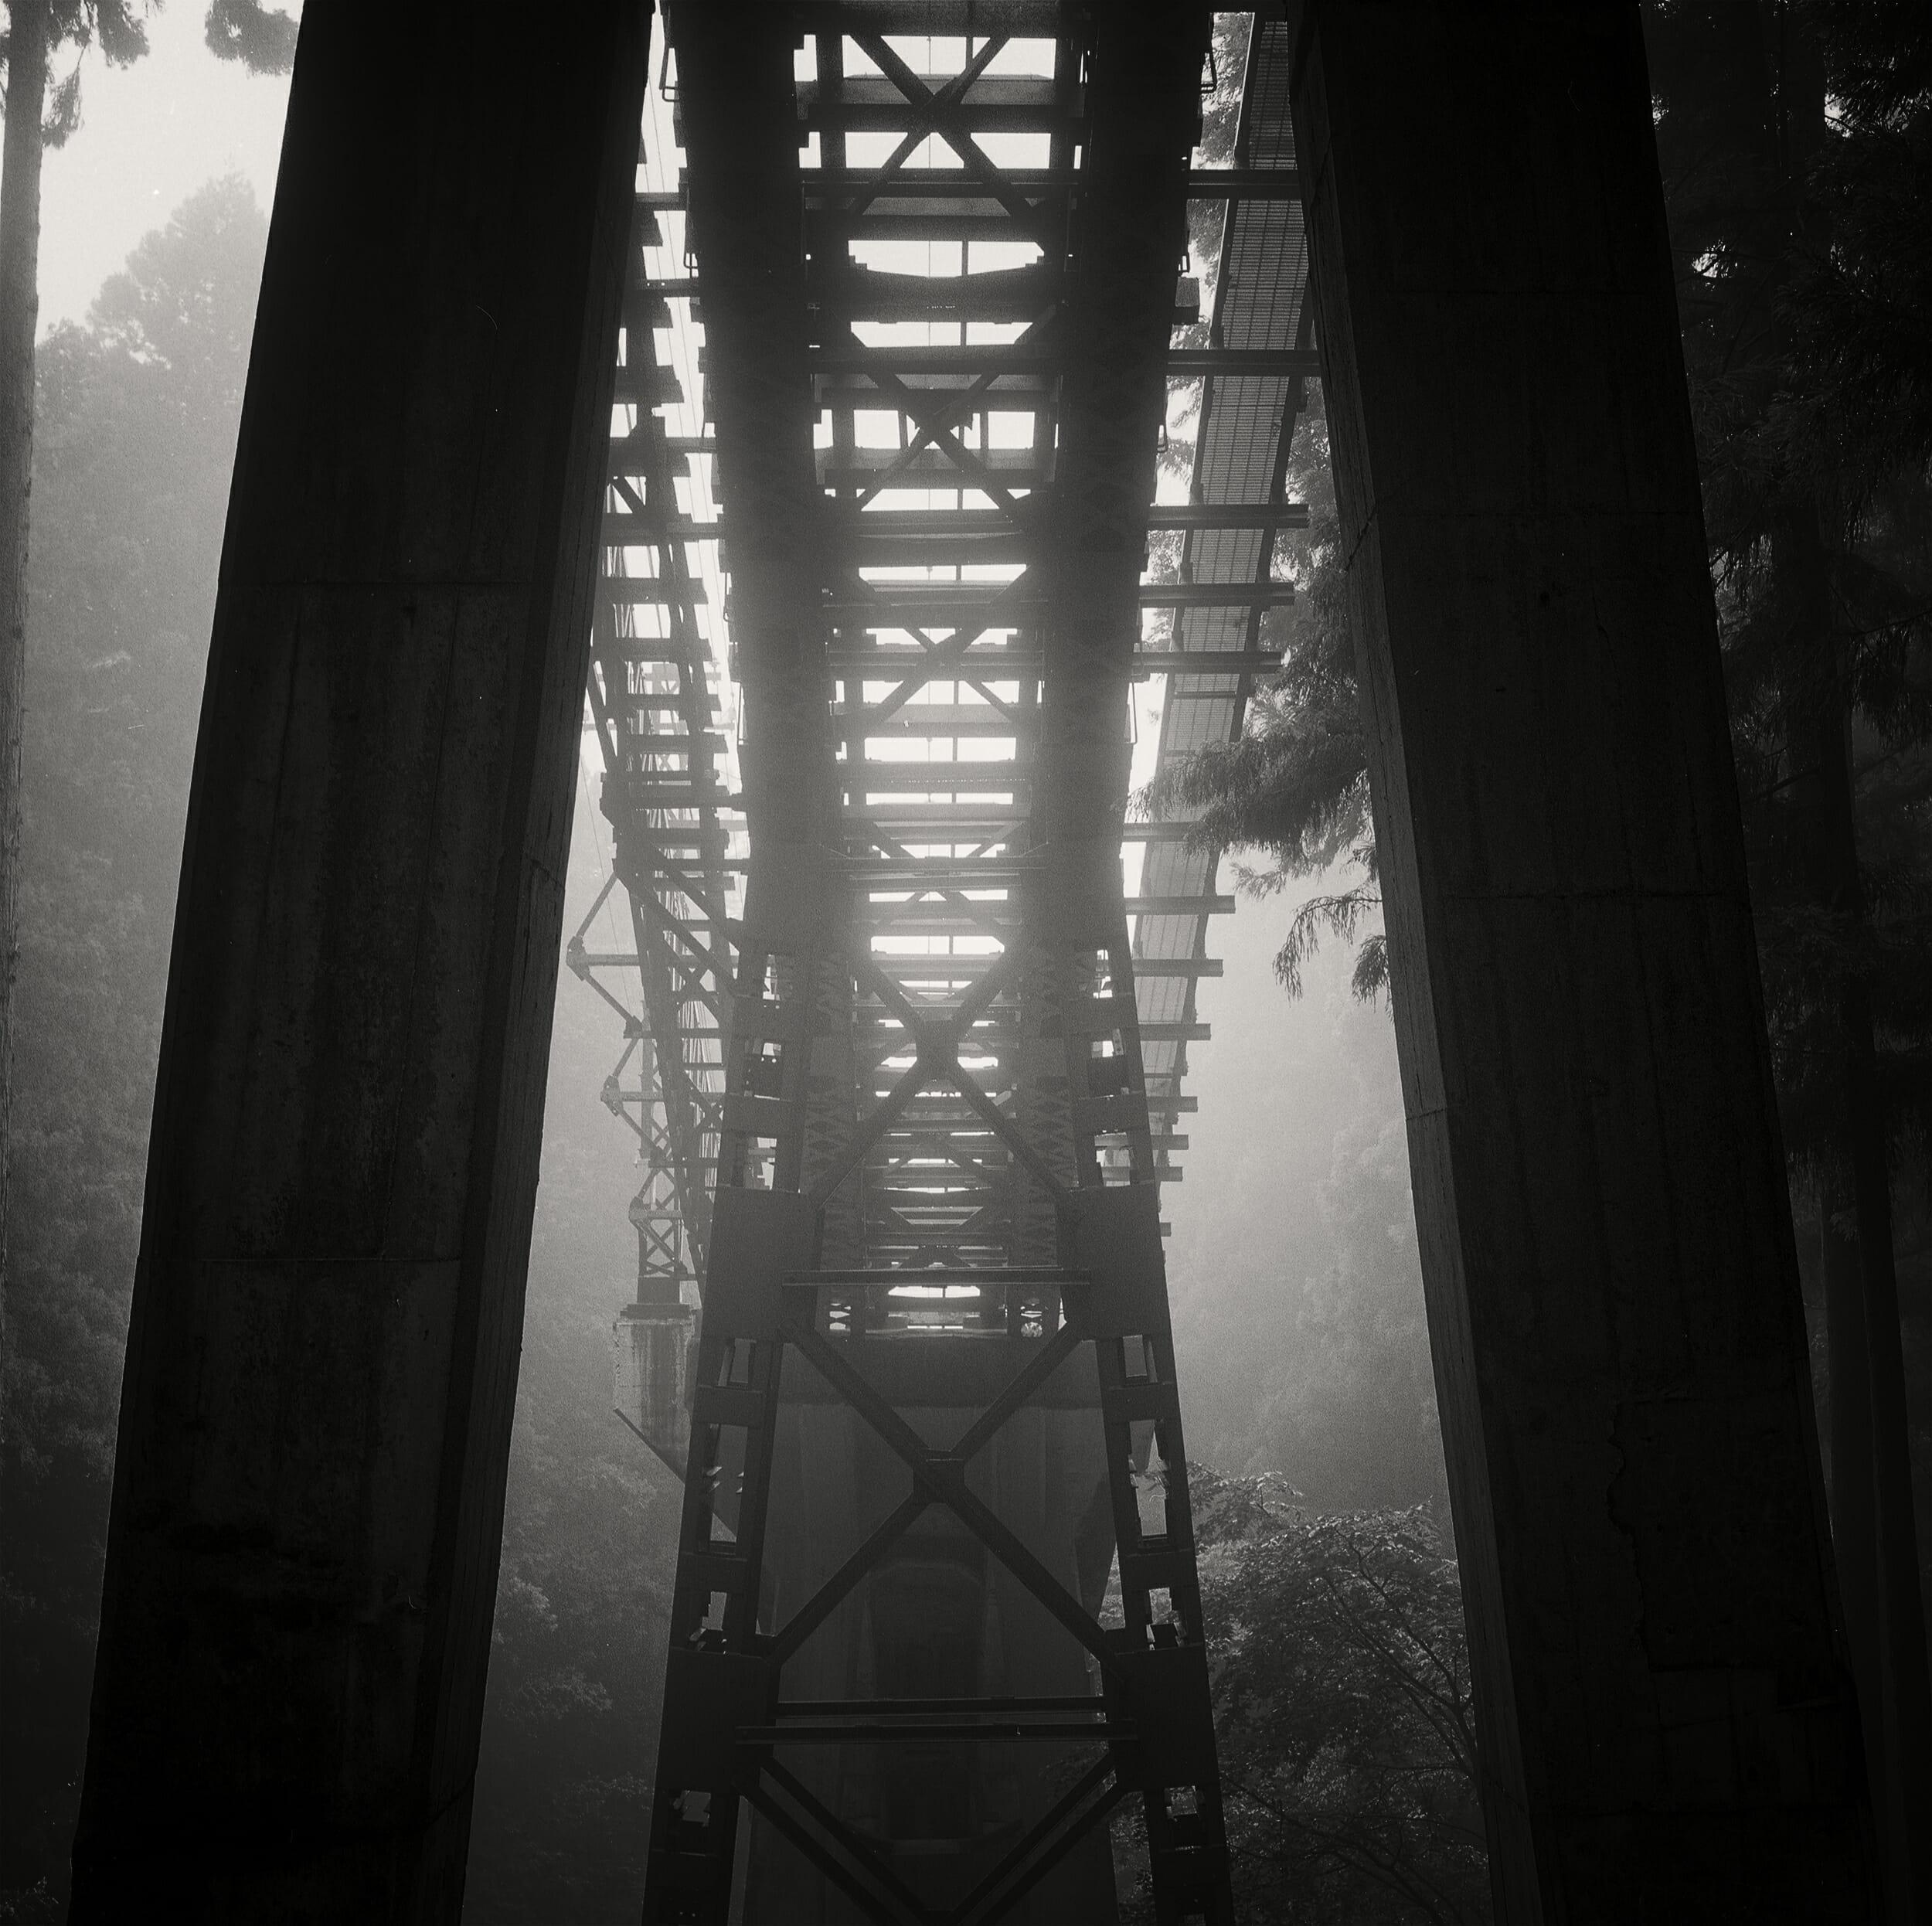 Elevated Tram Tracks, Mt Mitake, David R Munson